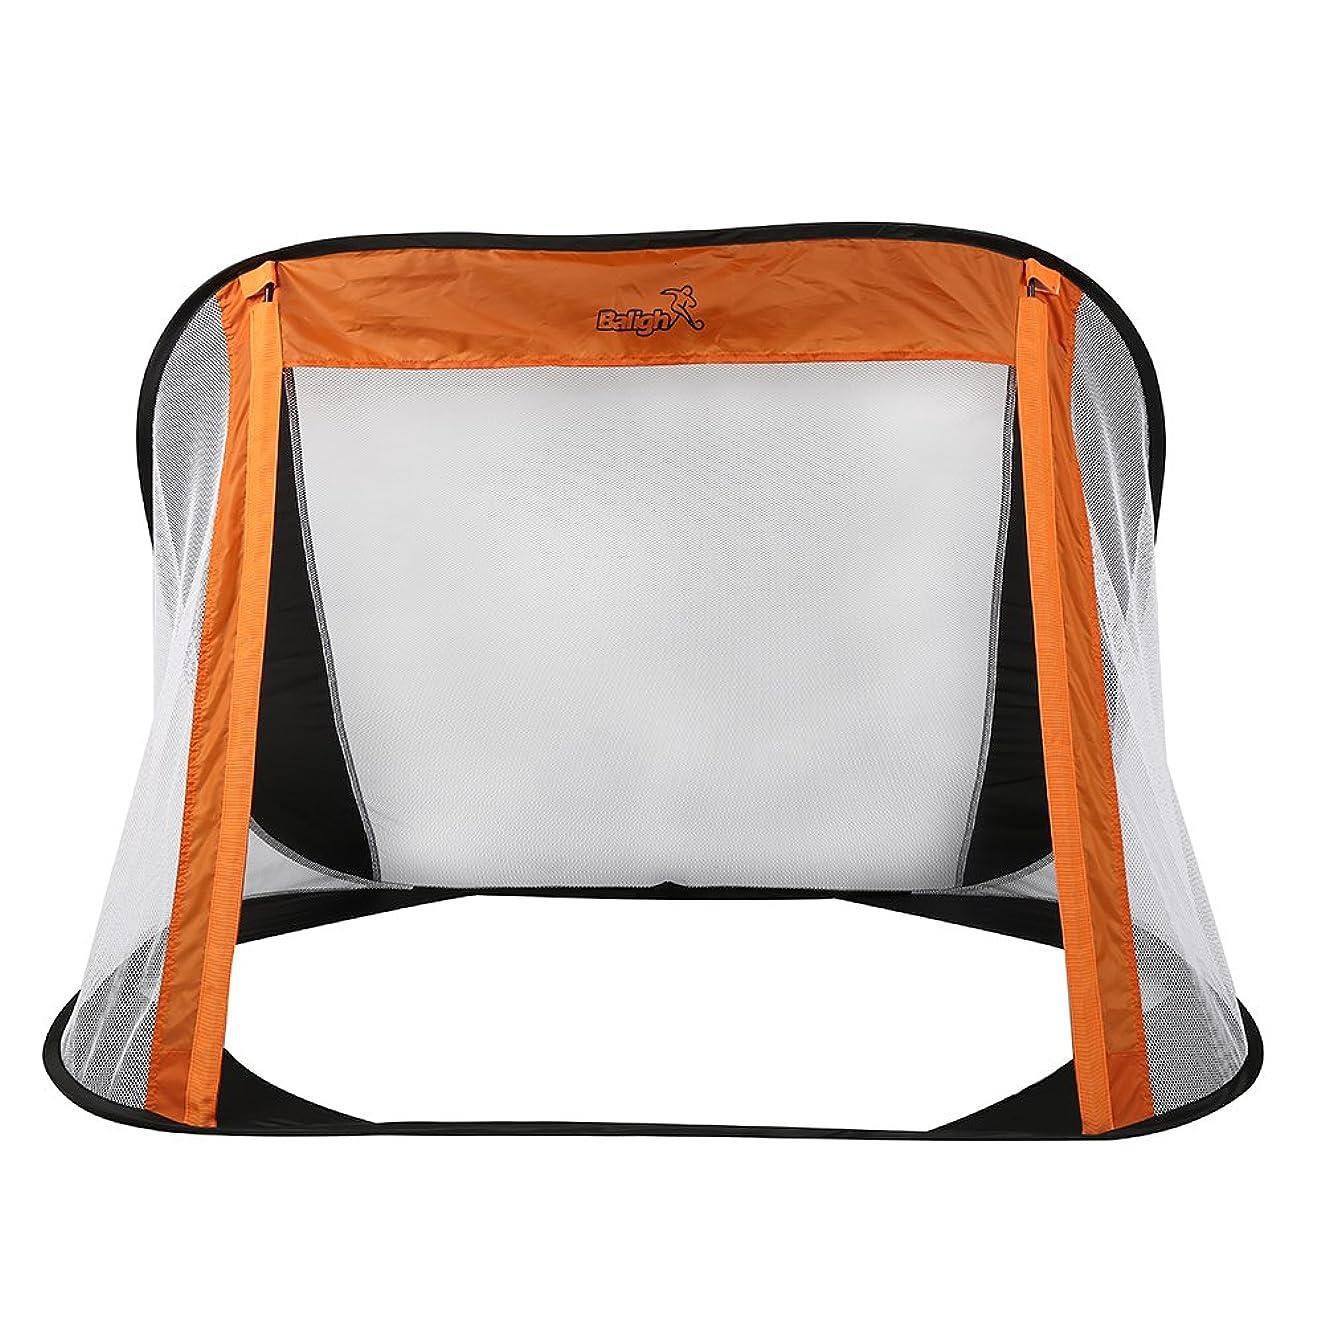 Tutuba Portable Easy Storage Folding Football Training Net Outdoor Kicking Door(Ship from USA)